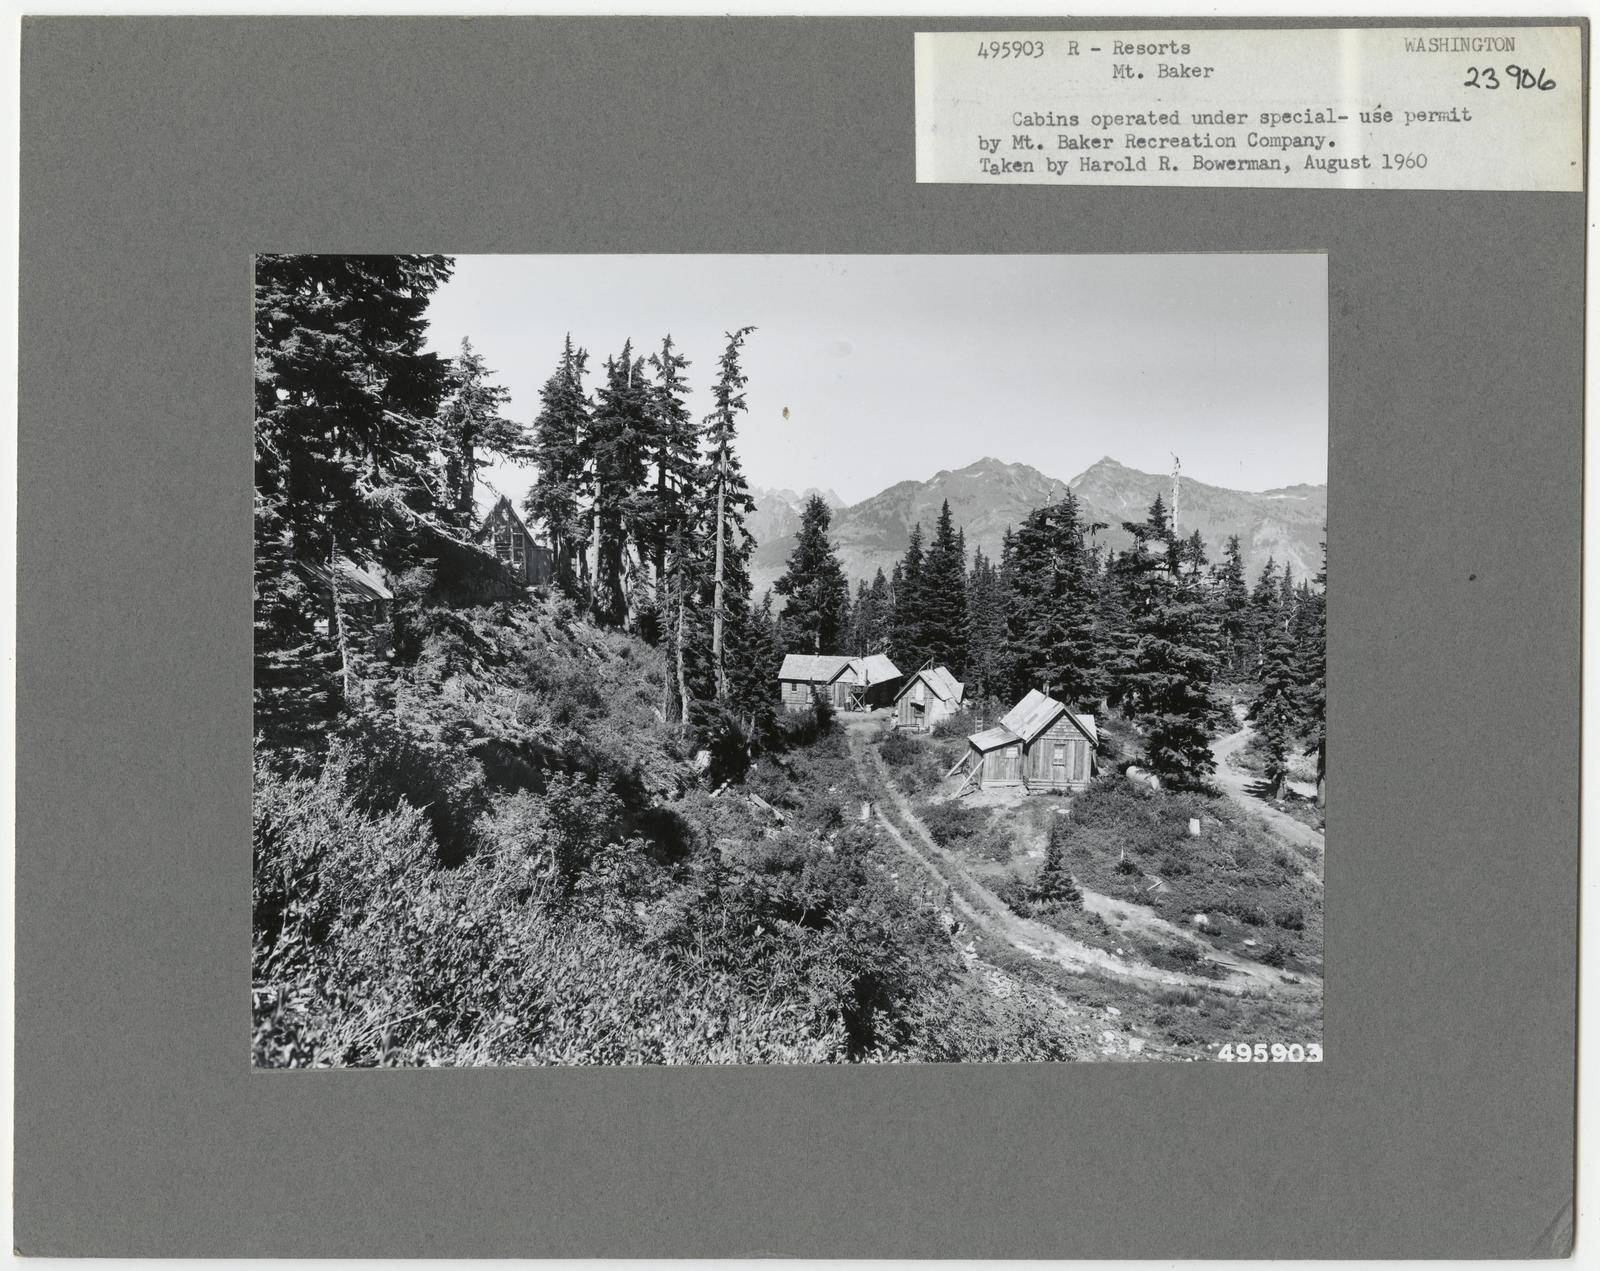 Resorts and Other Dwellings - Washington